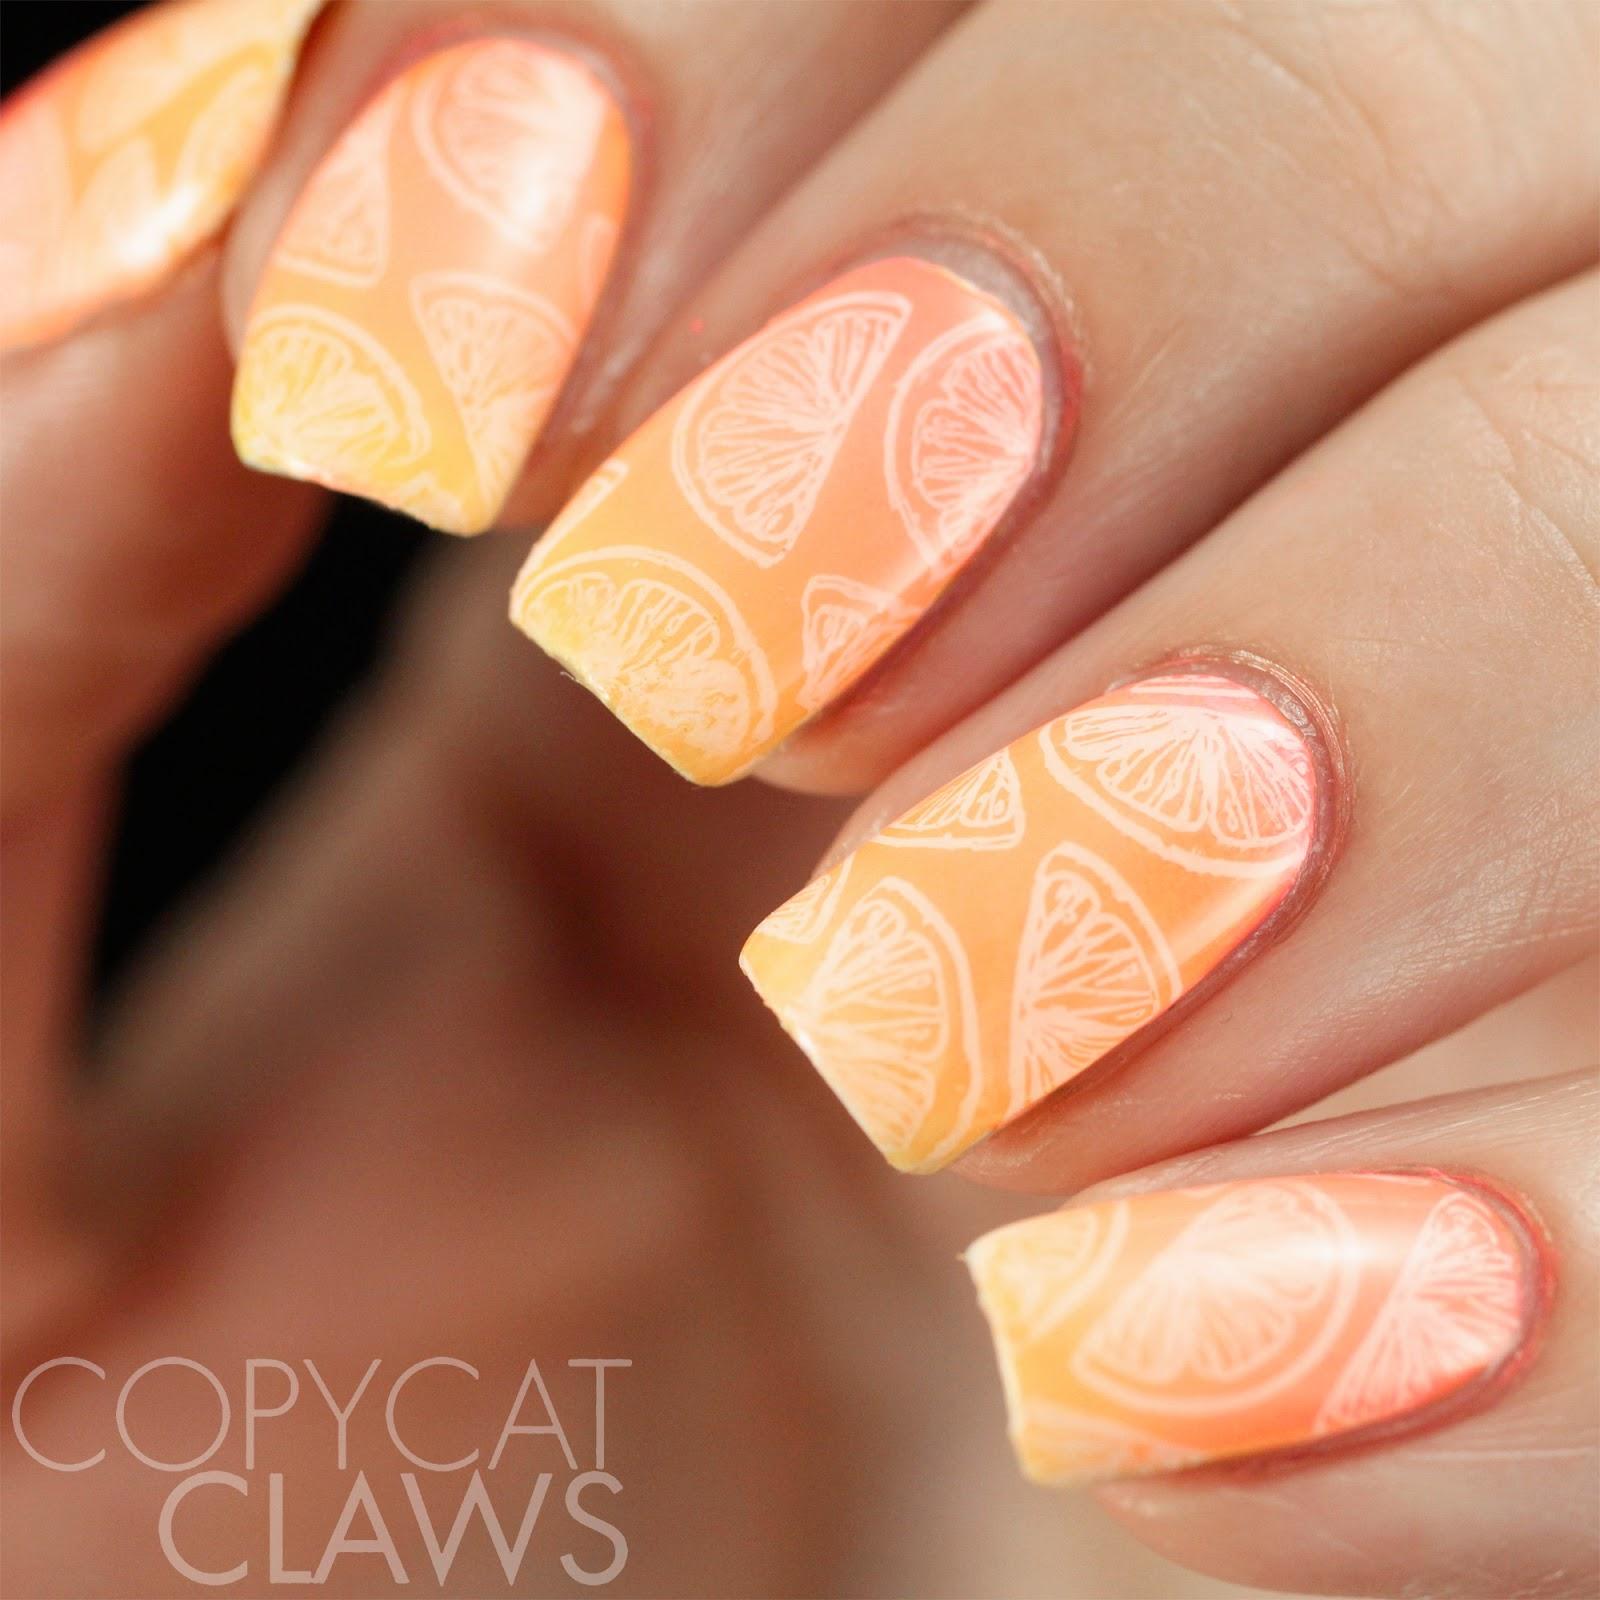 Copycat Claws: Lina Nail Art Supplies Summer 02 and Make Your Mark 05